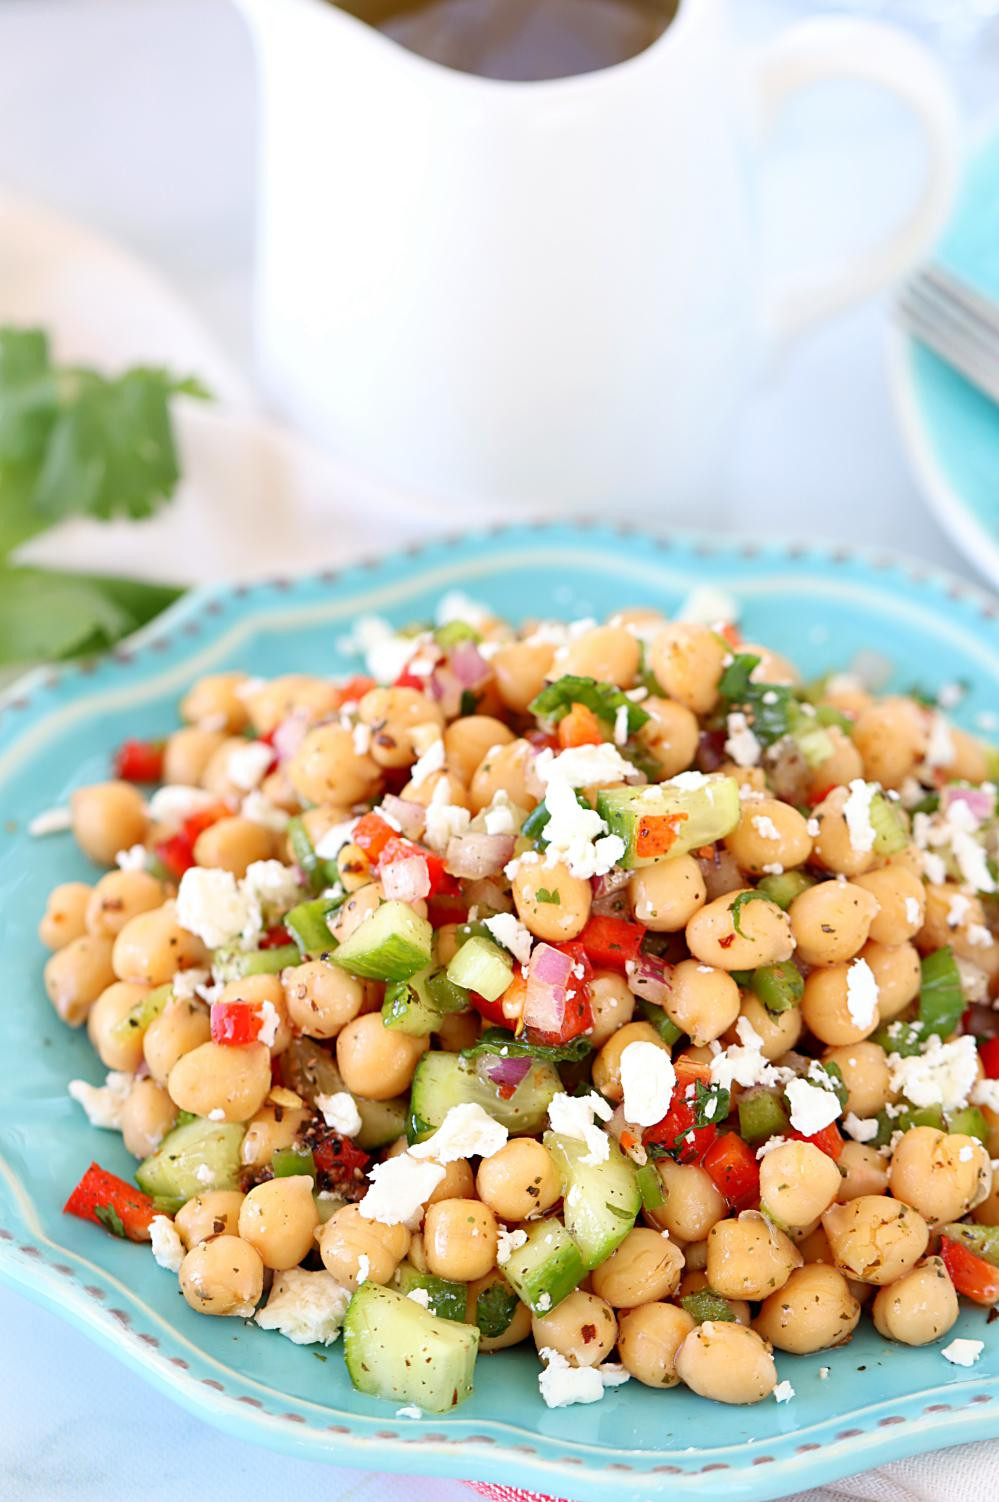 Chickpea Salad Recipes  Chana Salad or Chickpea Salad Easy no cook summer